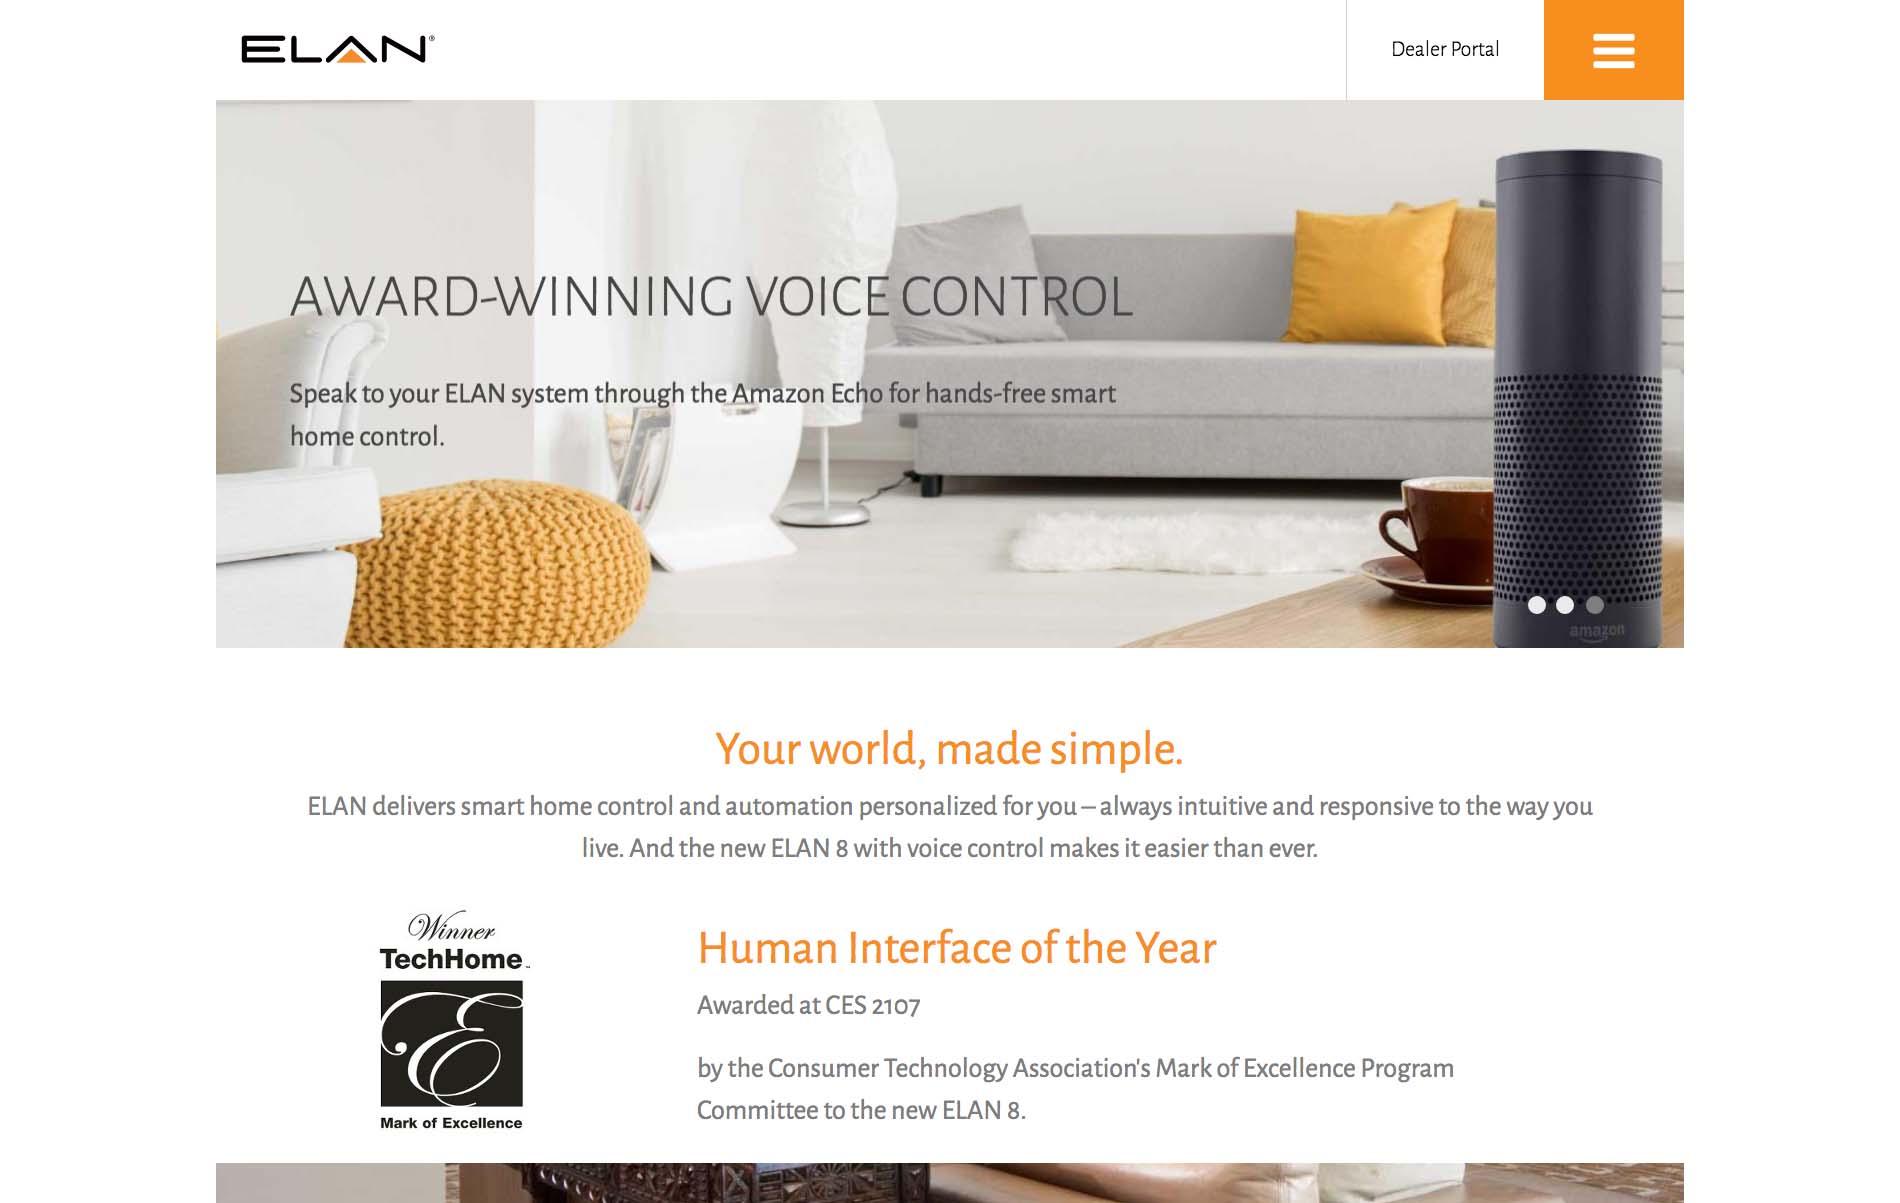 Horizon Interactive Awards Web Site Awards 2016